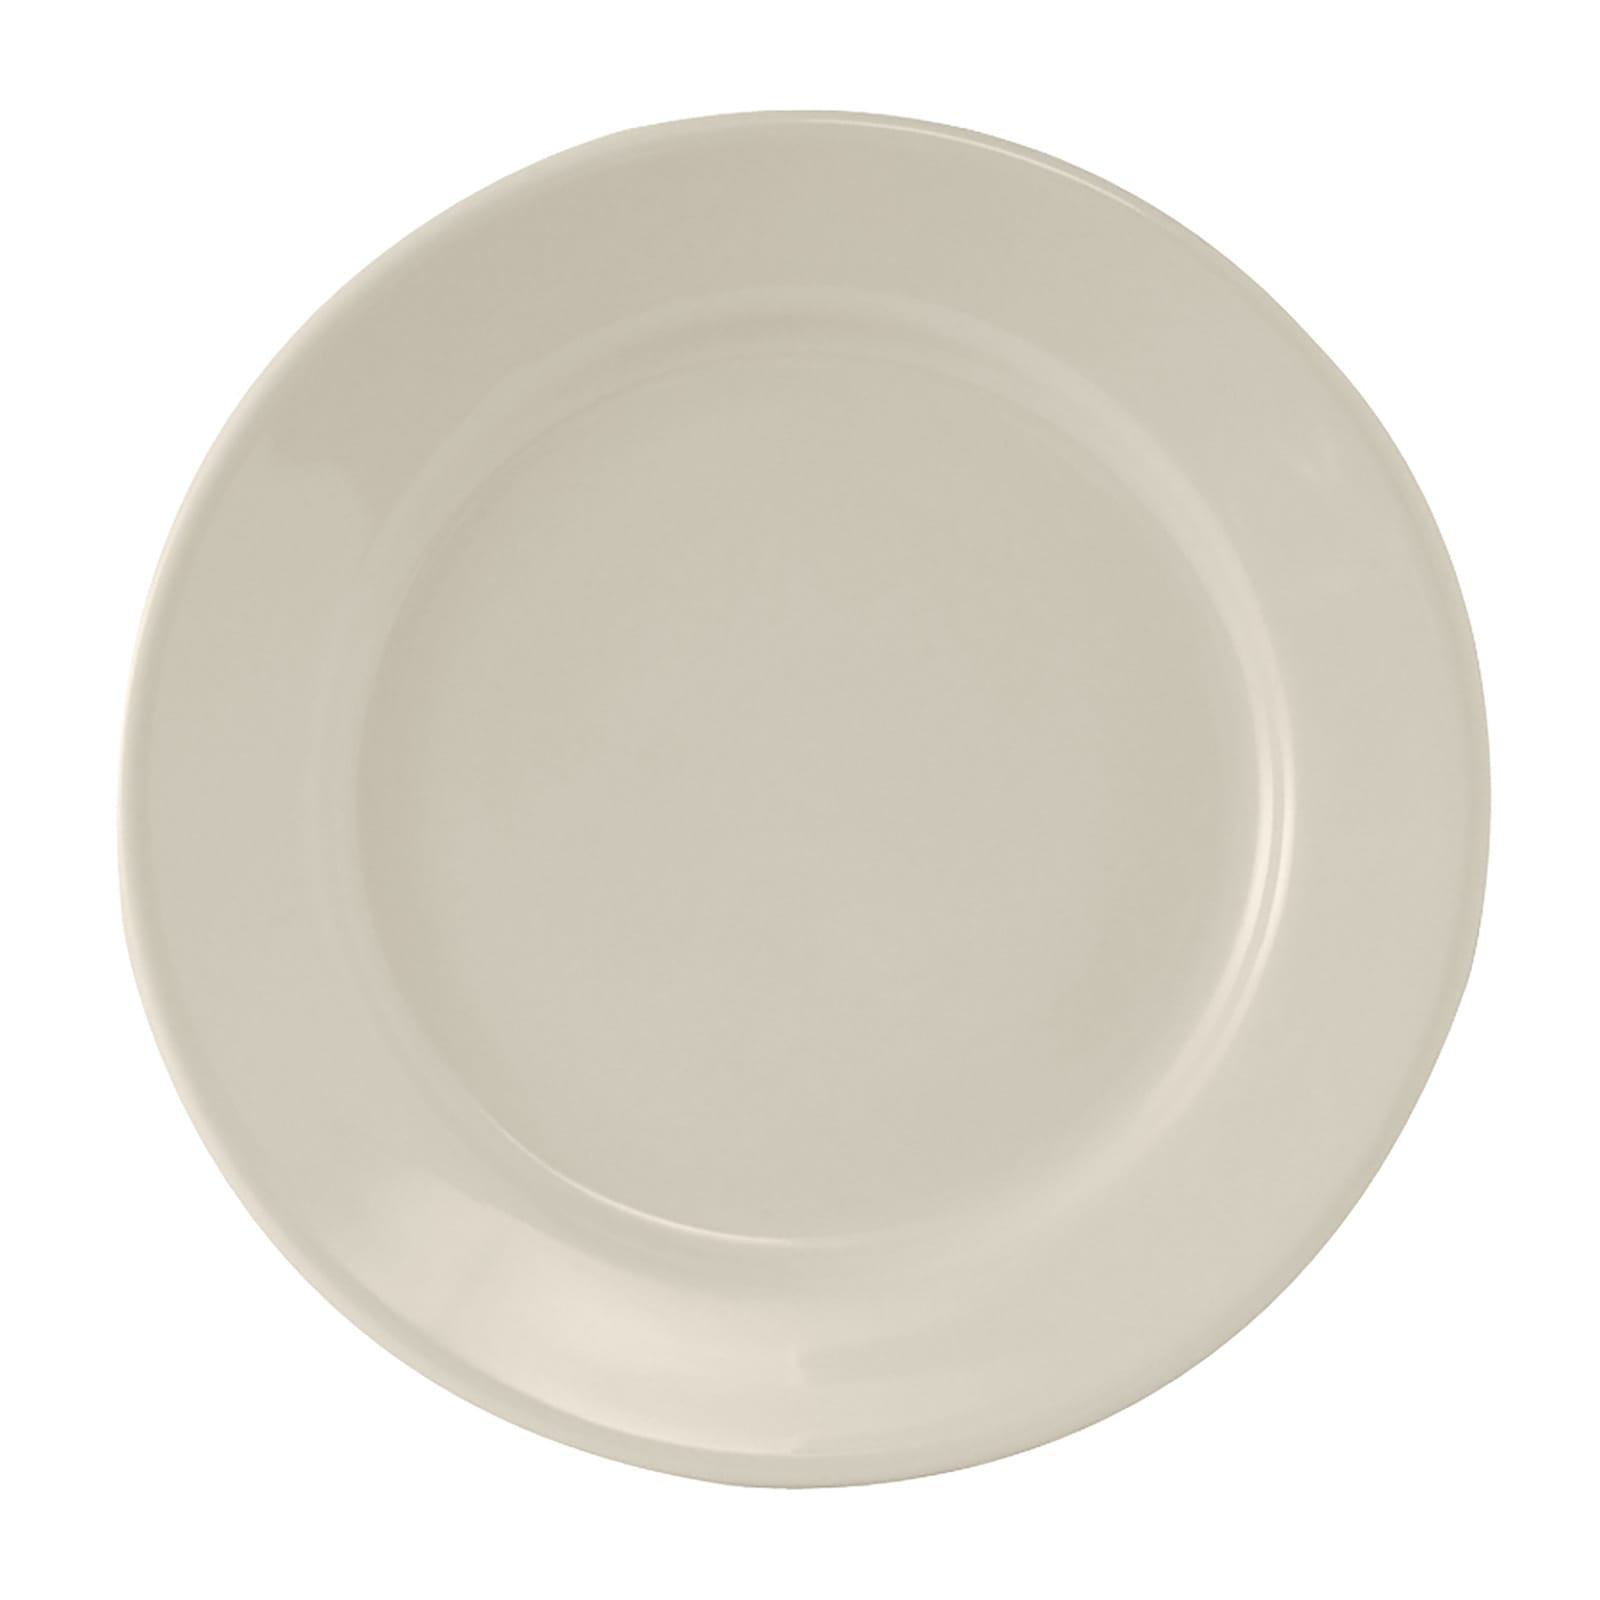 "Tuxton TRE-009 9.63"" Round Reno Plate - Ceramic, American White"